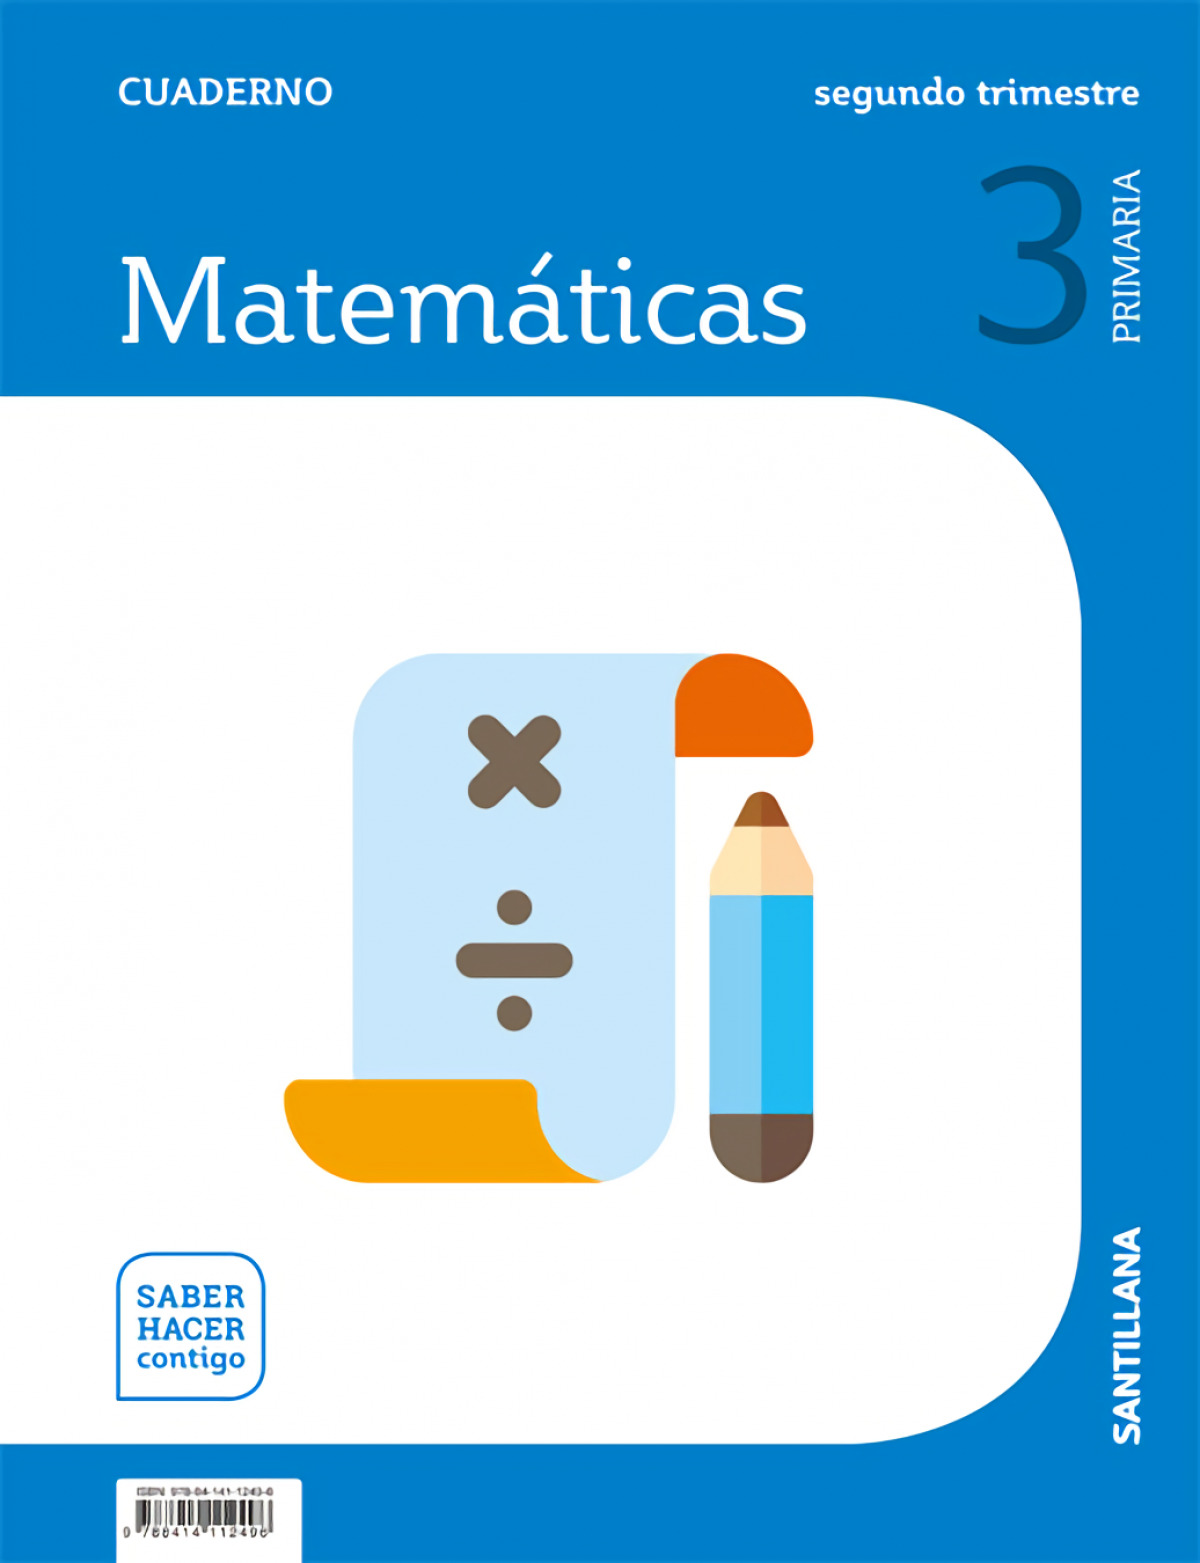 CUADERNO MATEMÁTICAS 2-3o.PRIMARIA. SABER HACER CONTIGO 9788414112496